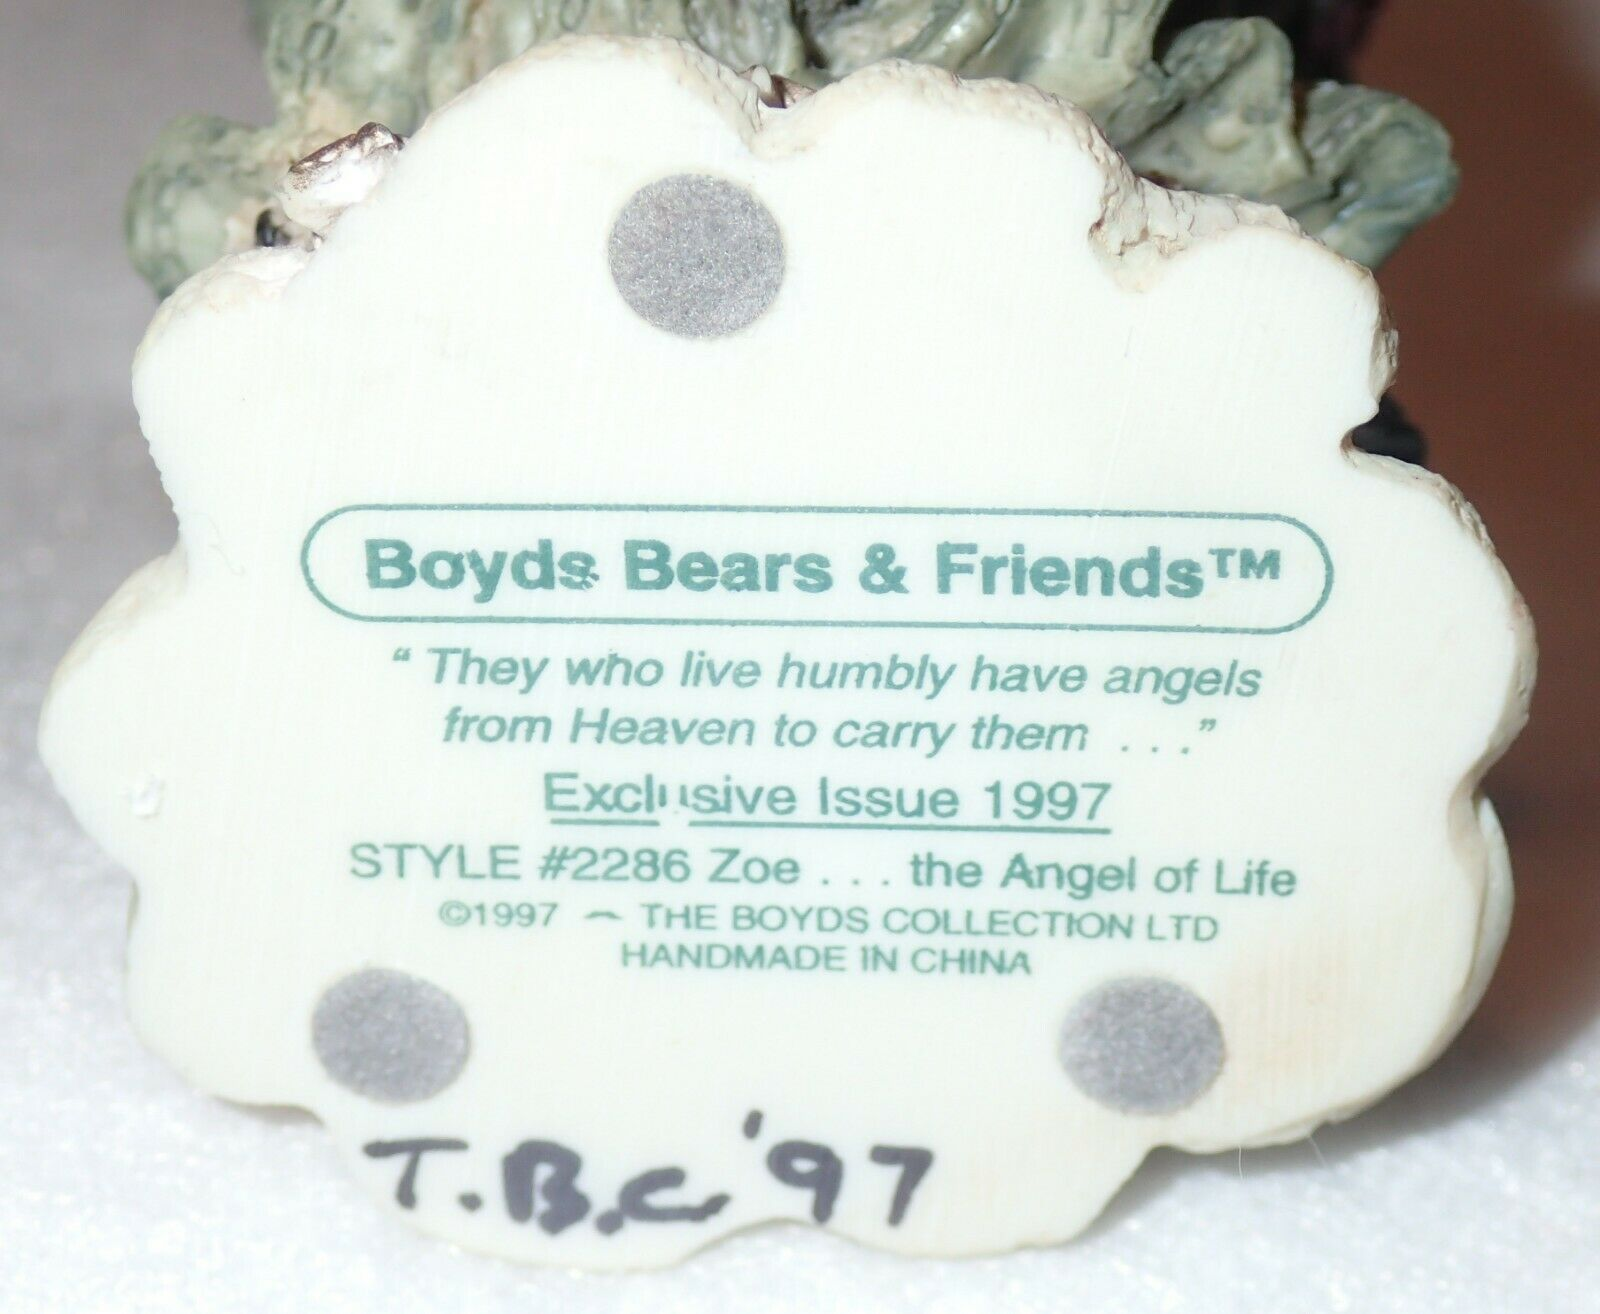 Boyd Bearstone Resin Bears Zoe The Angel Of Life Figurine #2286 NEW IN BOX image 4